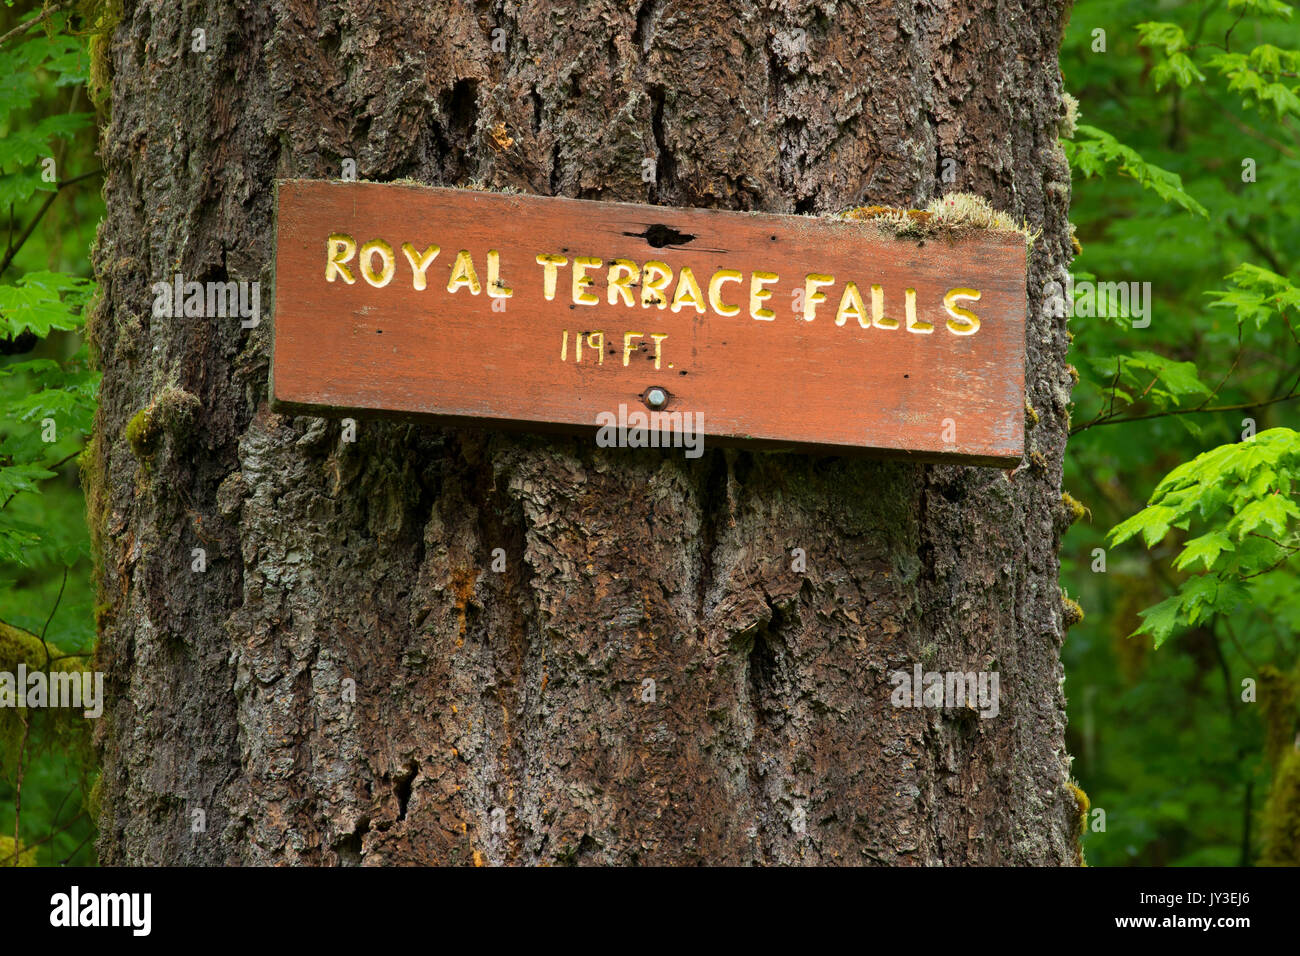 Royal Terrace Falls sign, McDowell Creek County Park, Linn County, Oregon - Stock Image